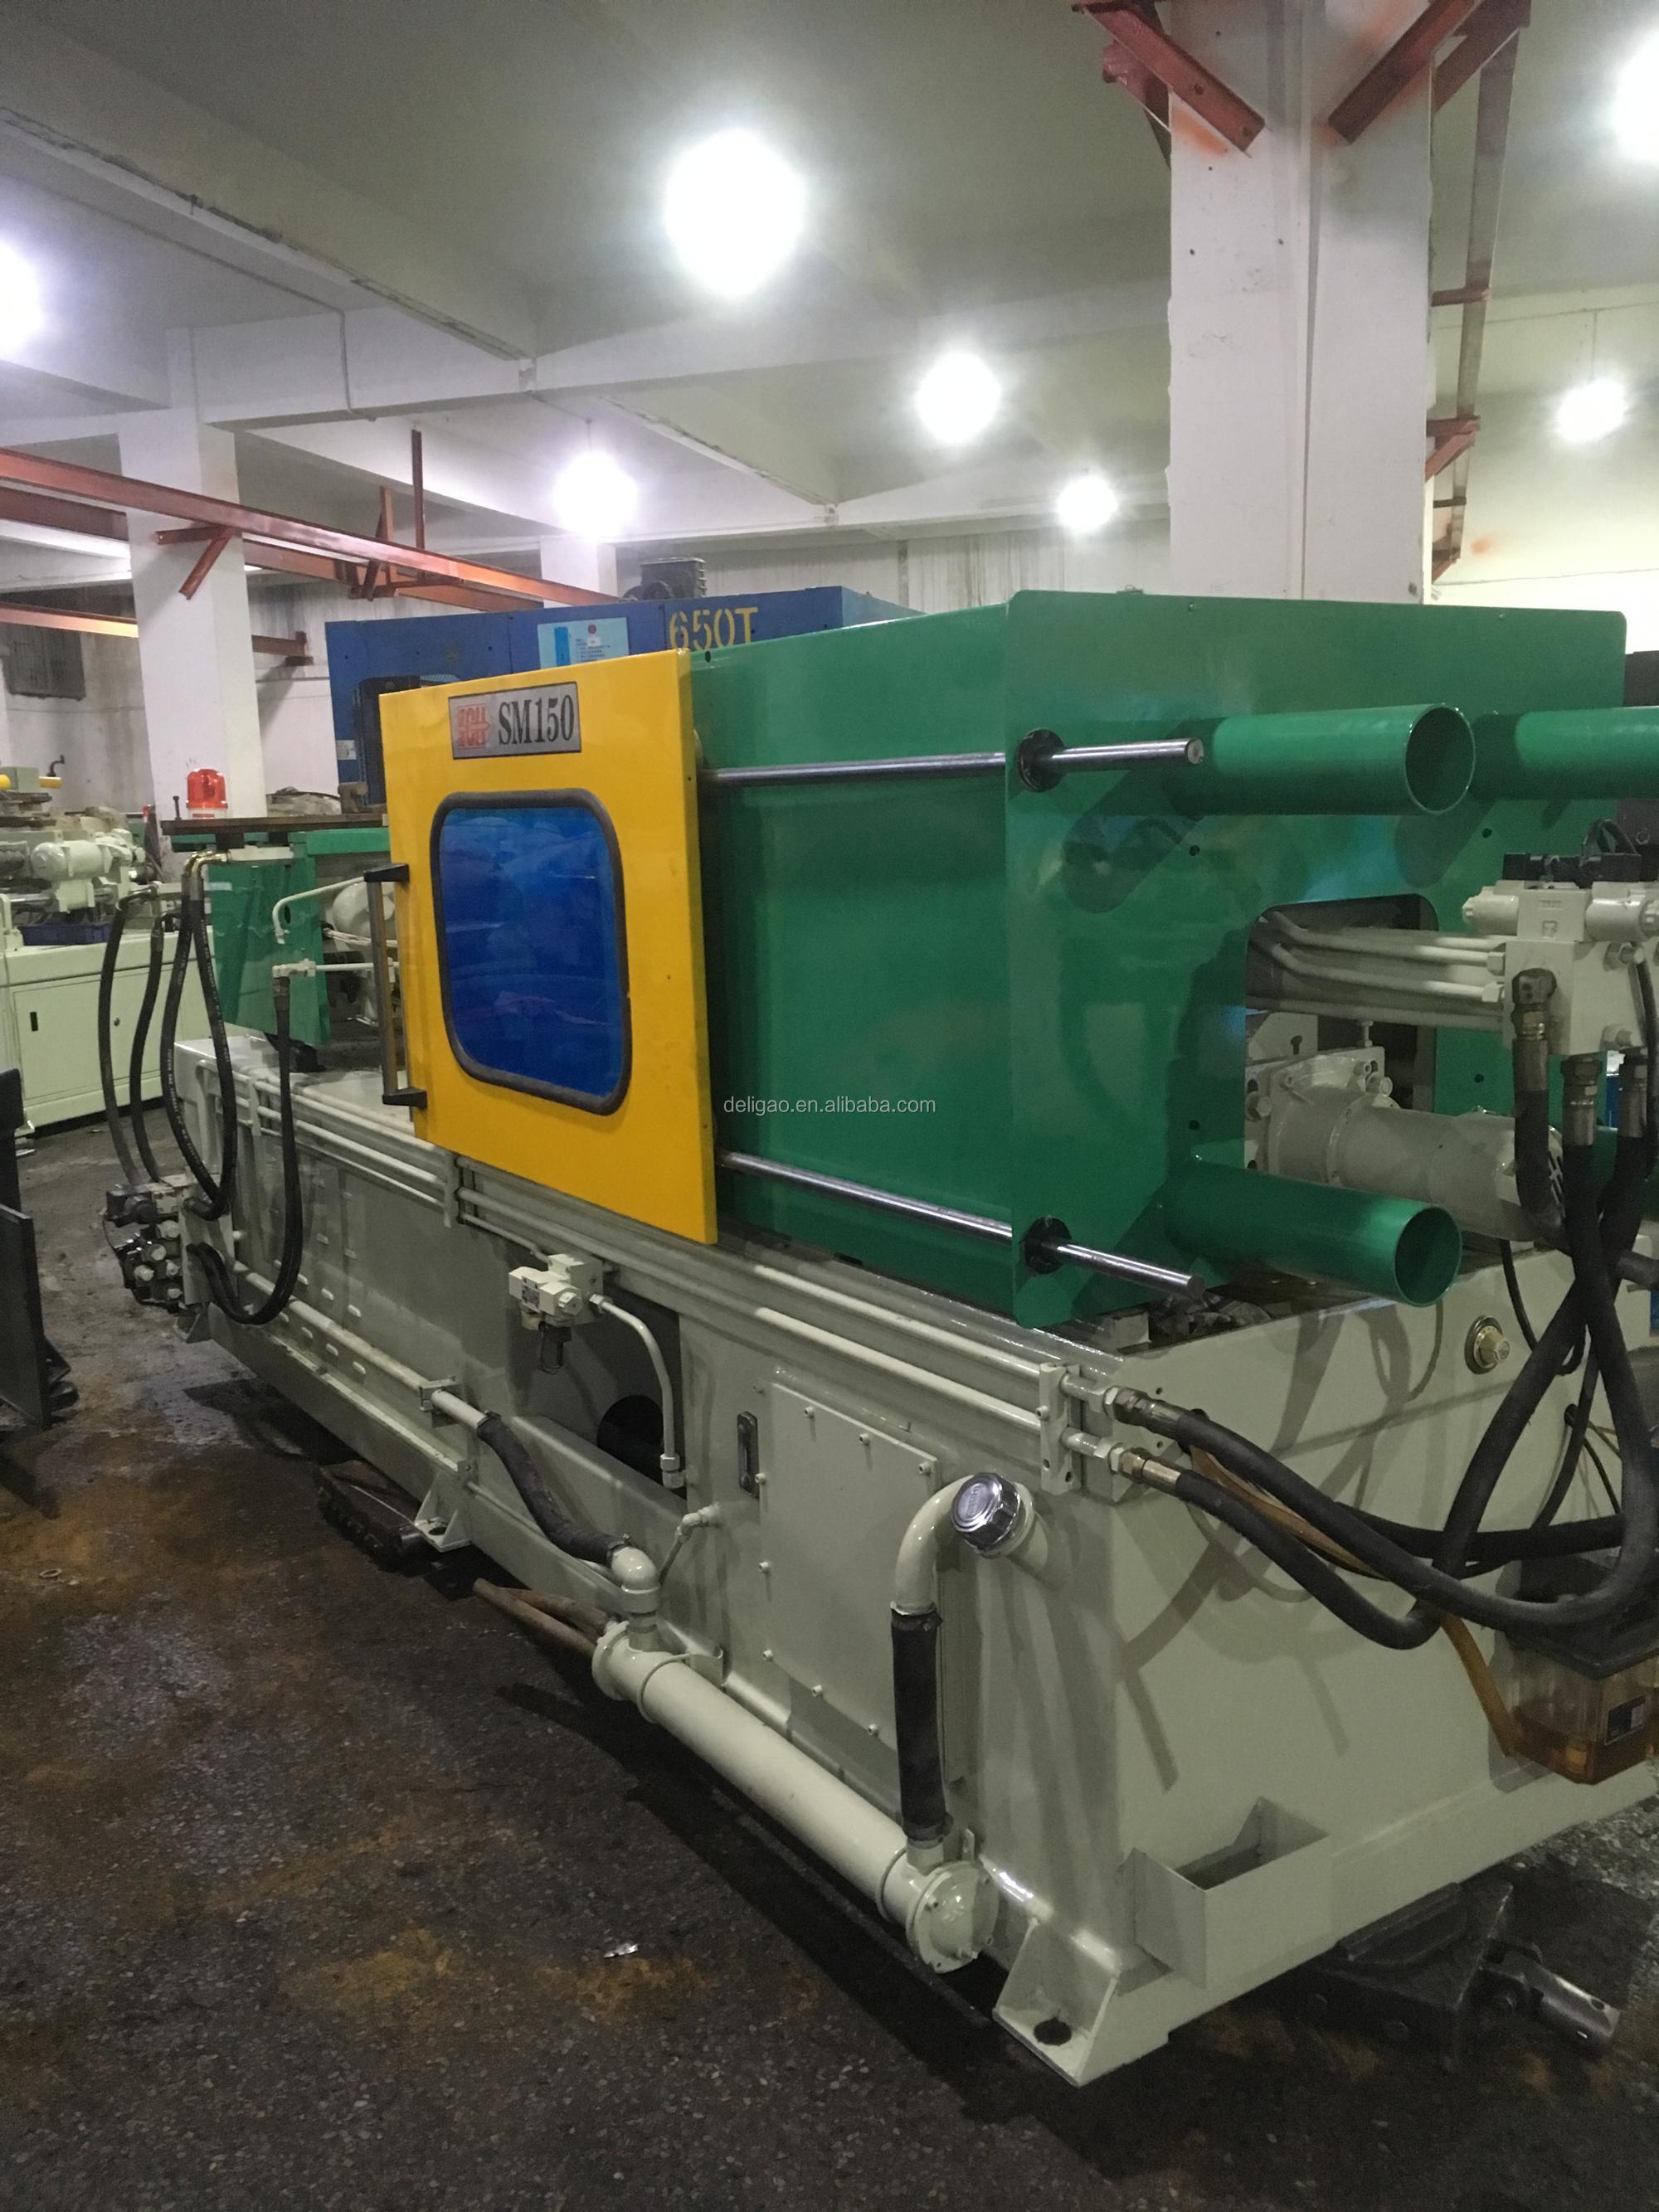 Second-hand Injection Molding Machine Servo Taiwan - Buy ...